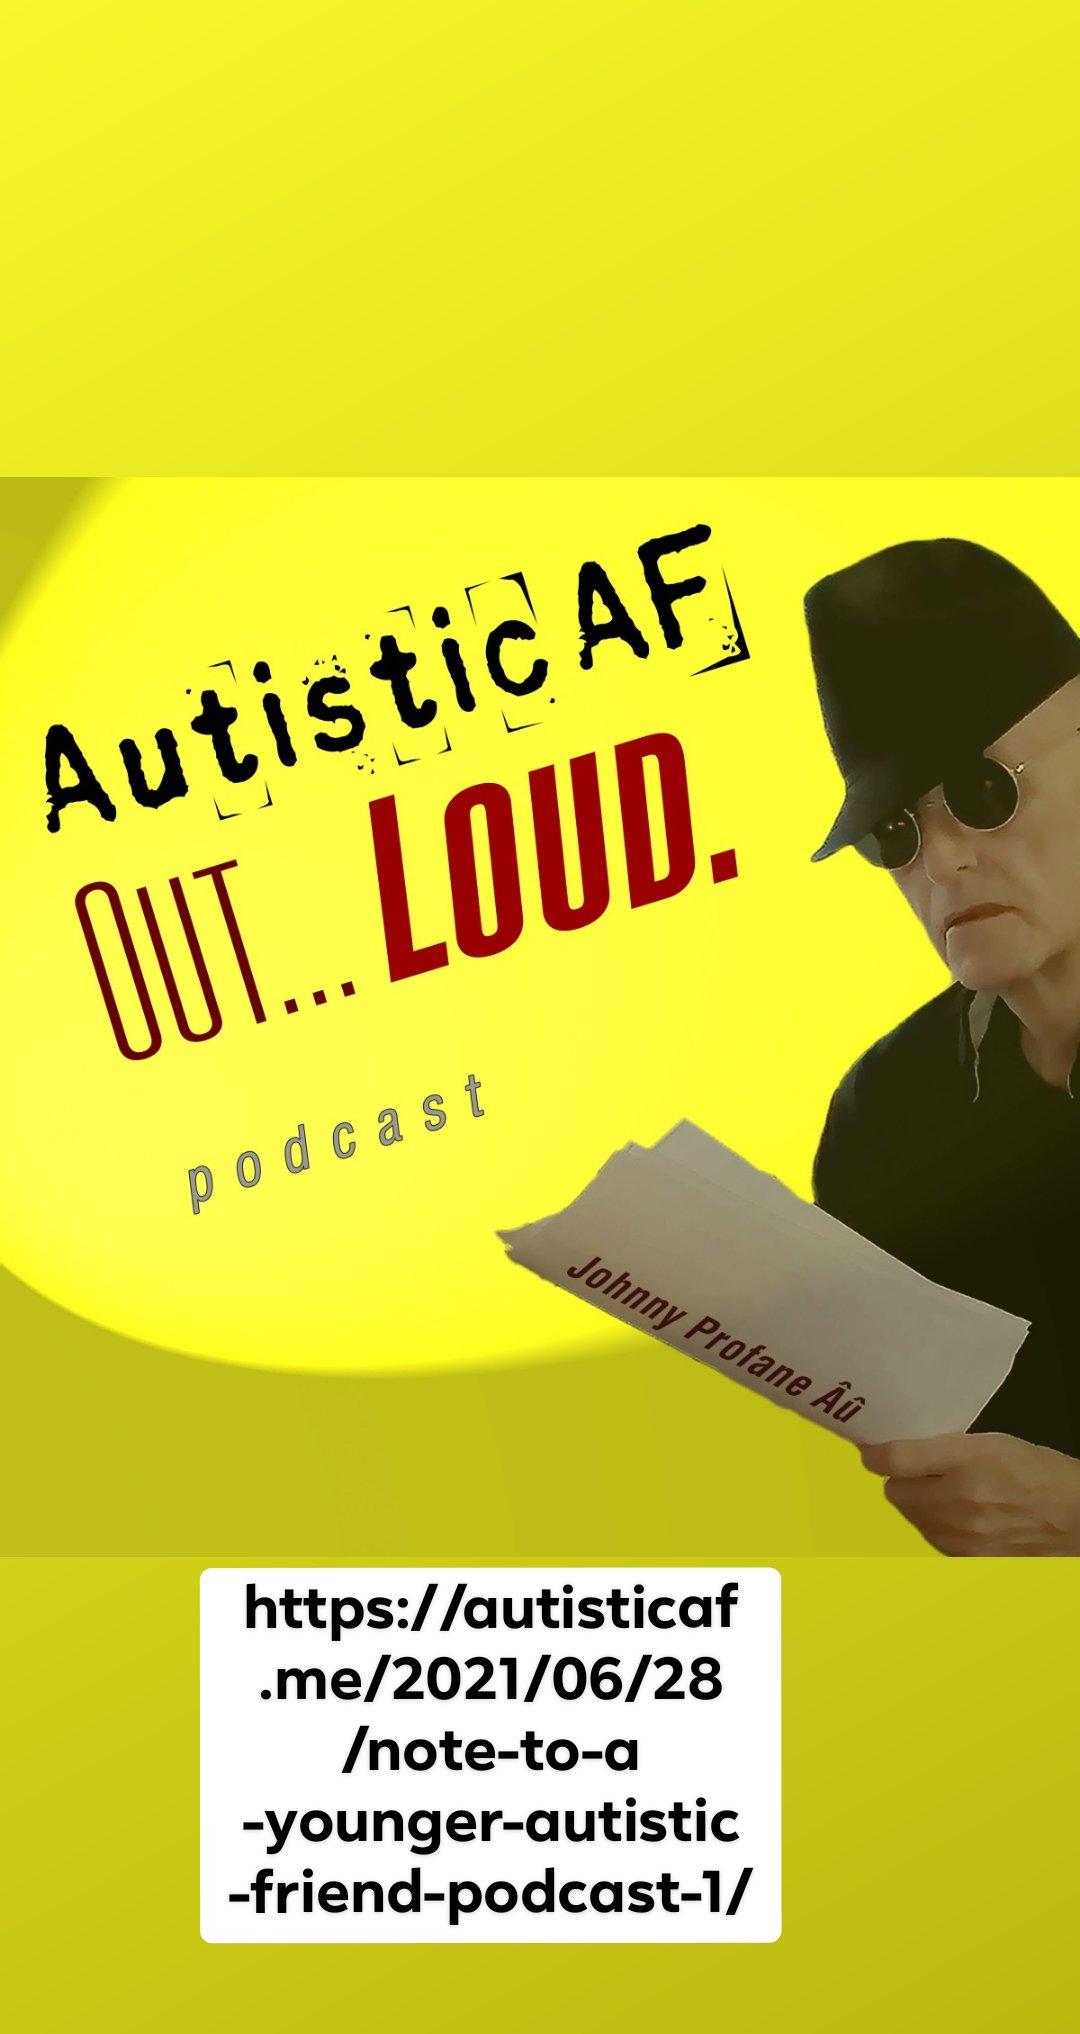 #AutisticAF Out Loud